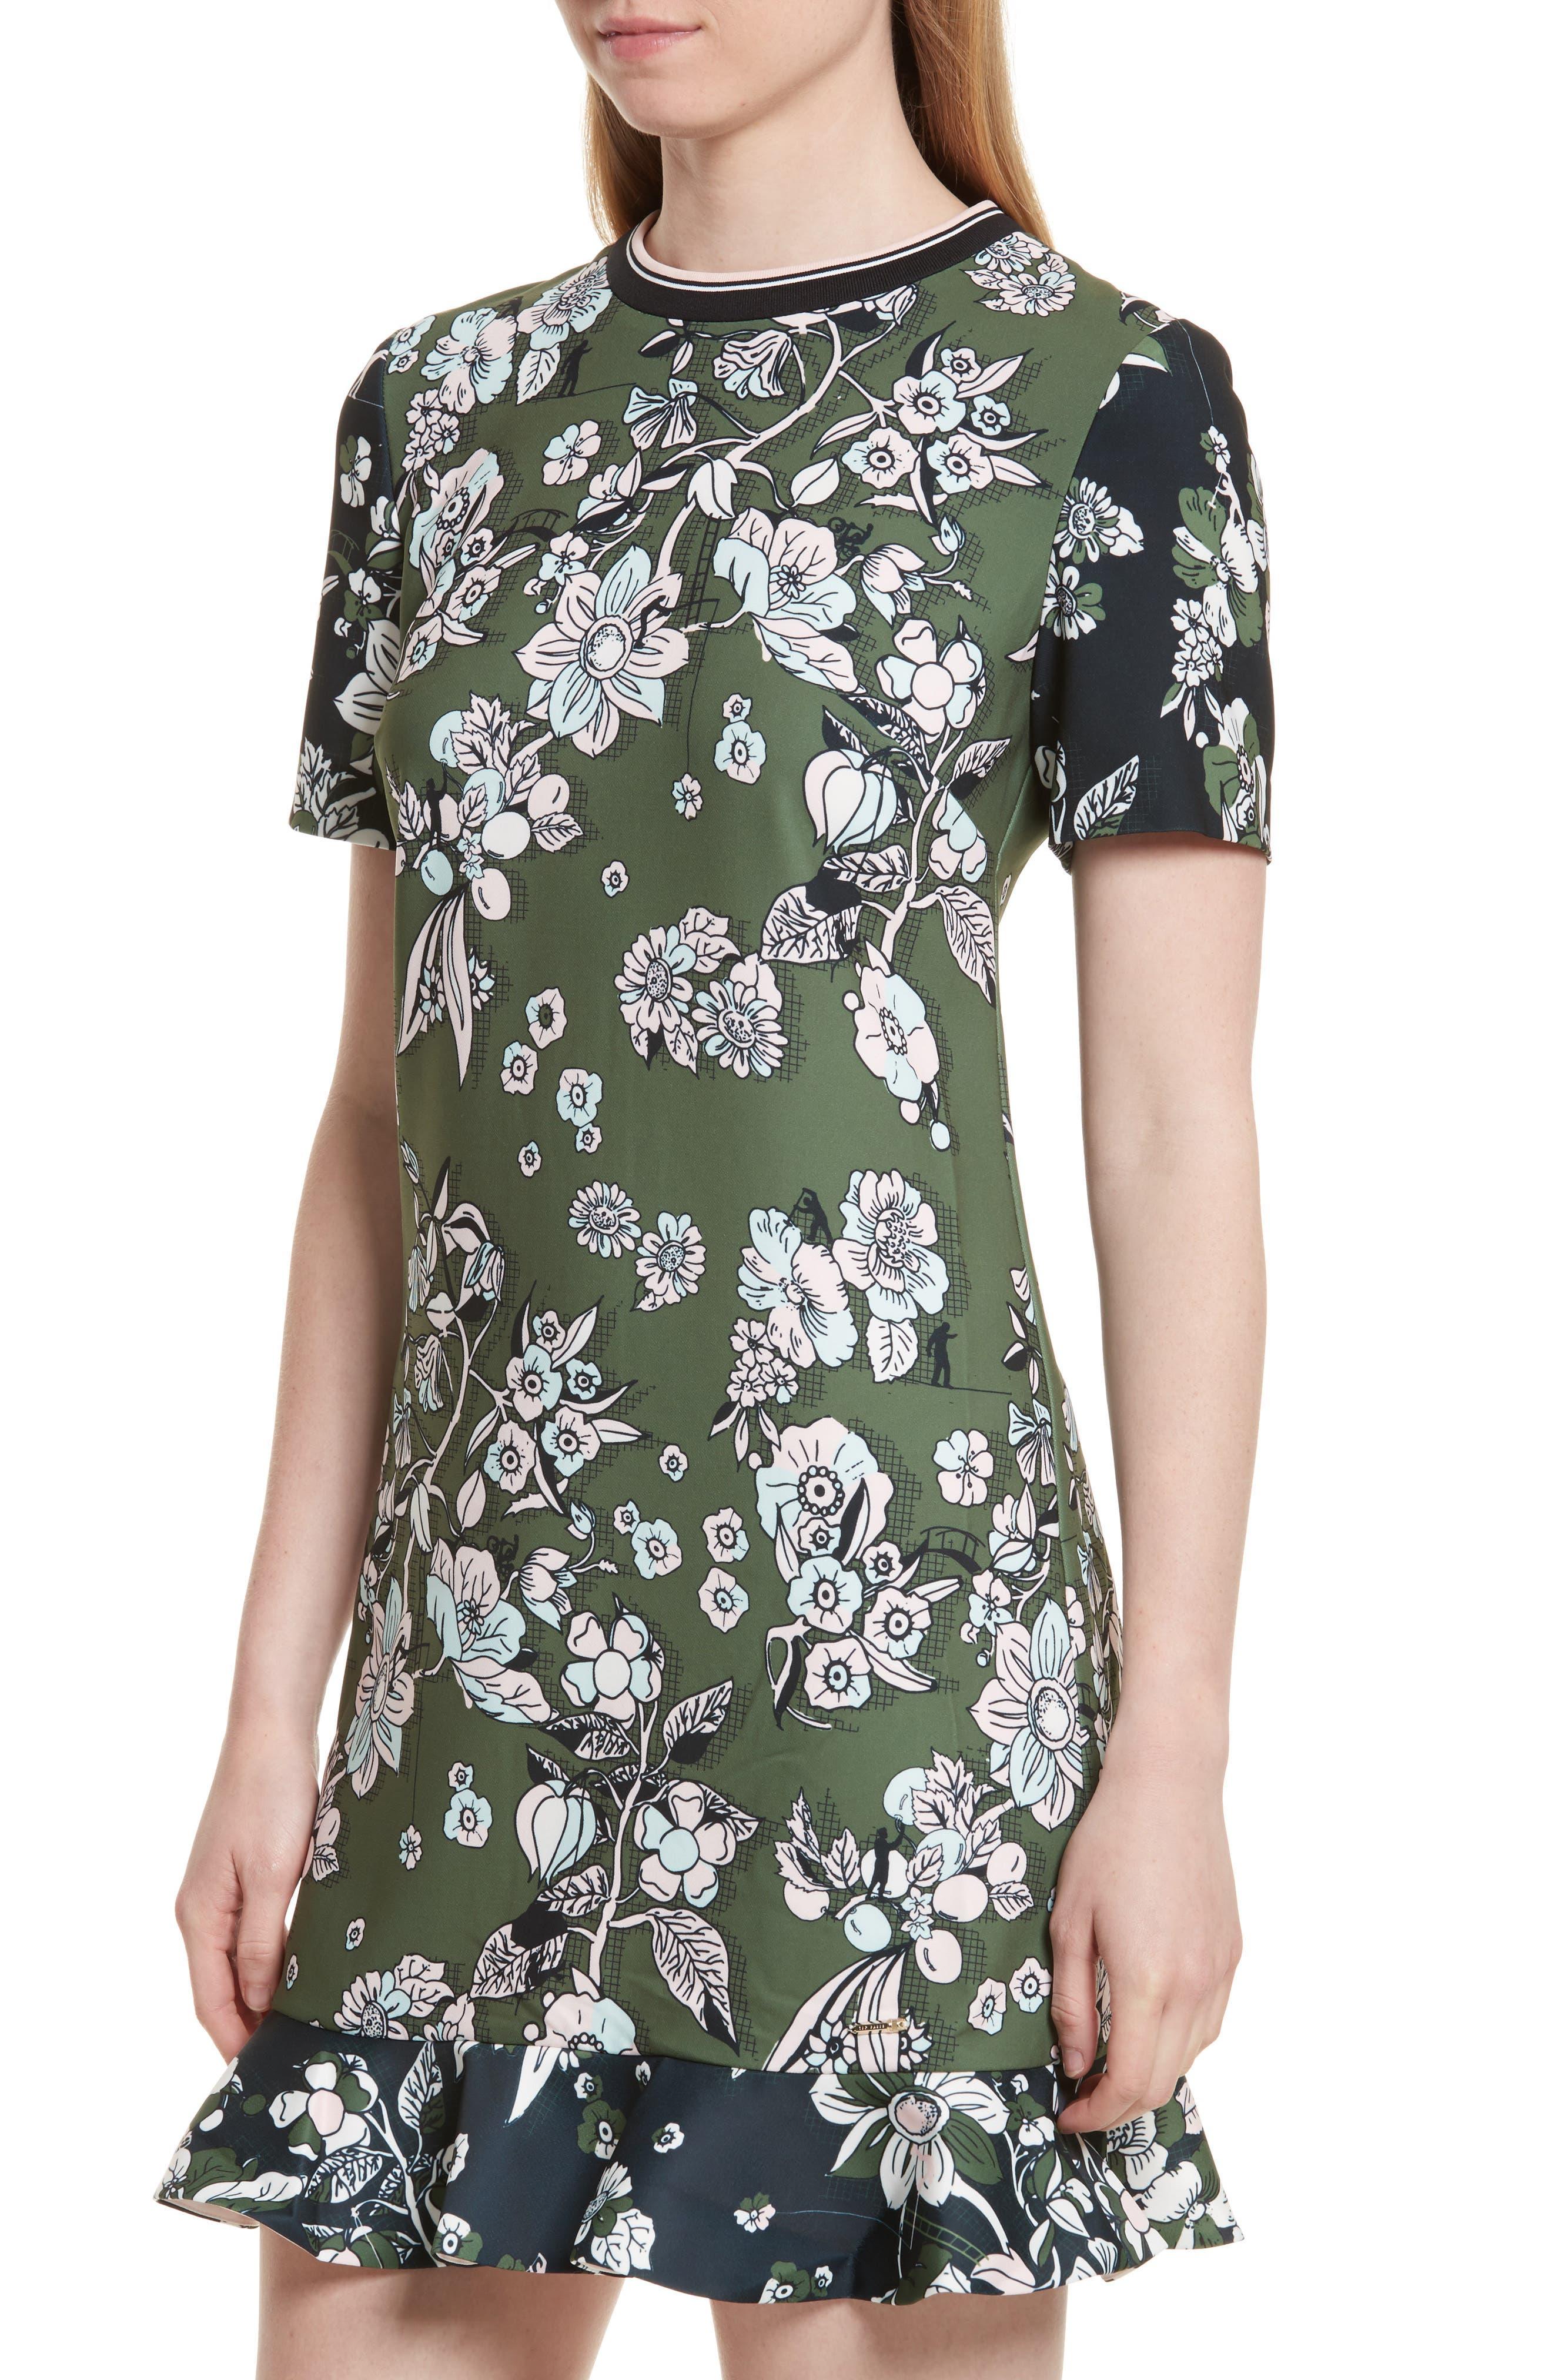 Hoster Floral Print Ruffle Hem Dress,                             Alternate thumbnail 4, color,                             Green